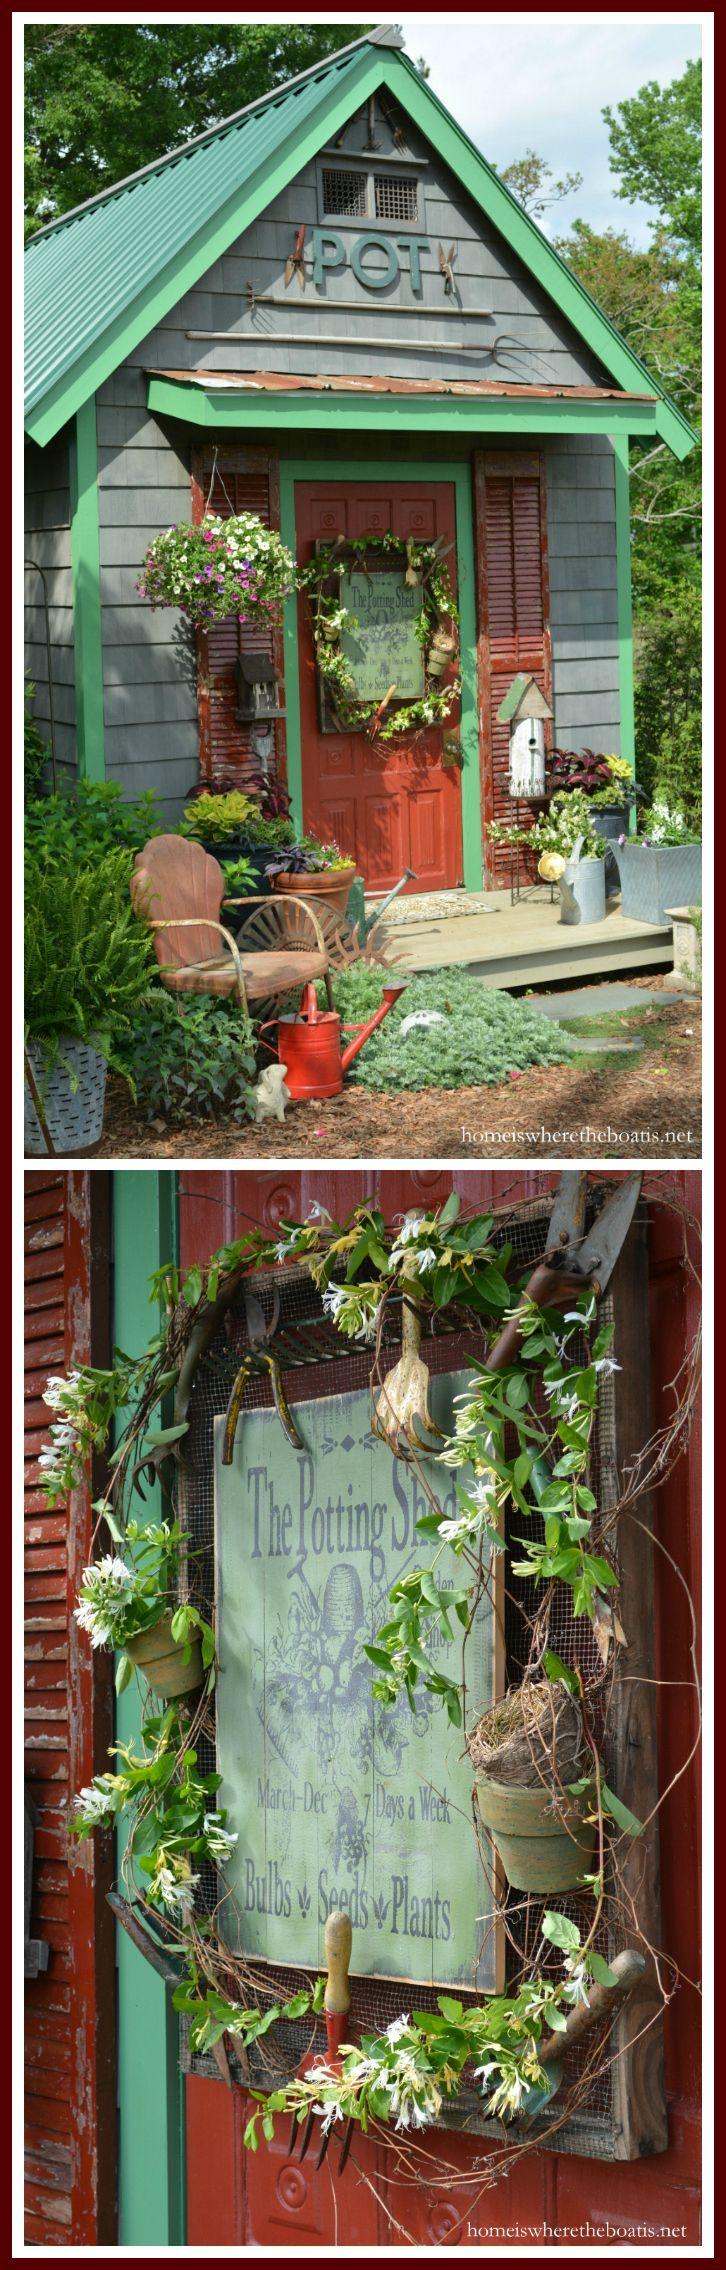 Potting Shed door sign! Hung on hardware cloth frame with vintage garden tools, pots, grapevine and honeysuckle! | homeiswheretheboatis.net #garden #spring